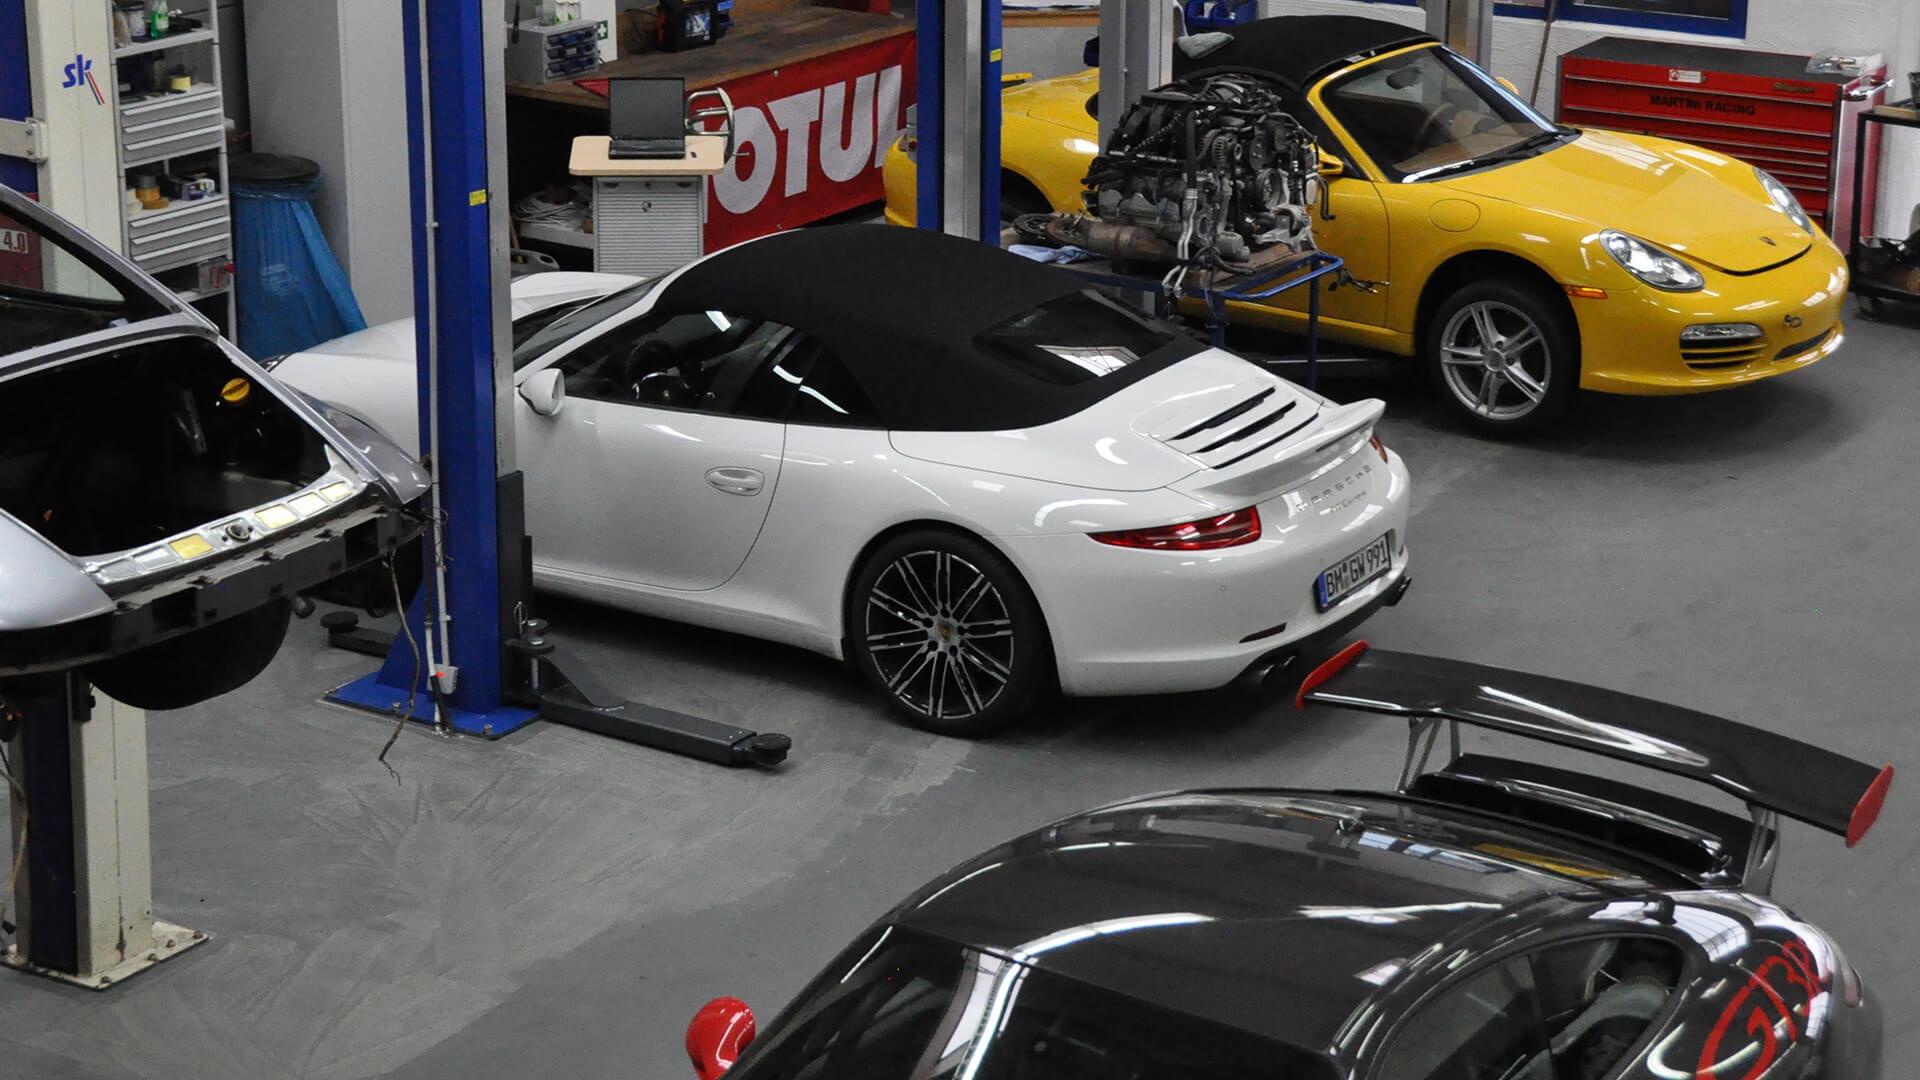 GT Sportwagen Galerie Bild Nr 3